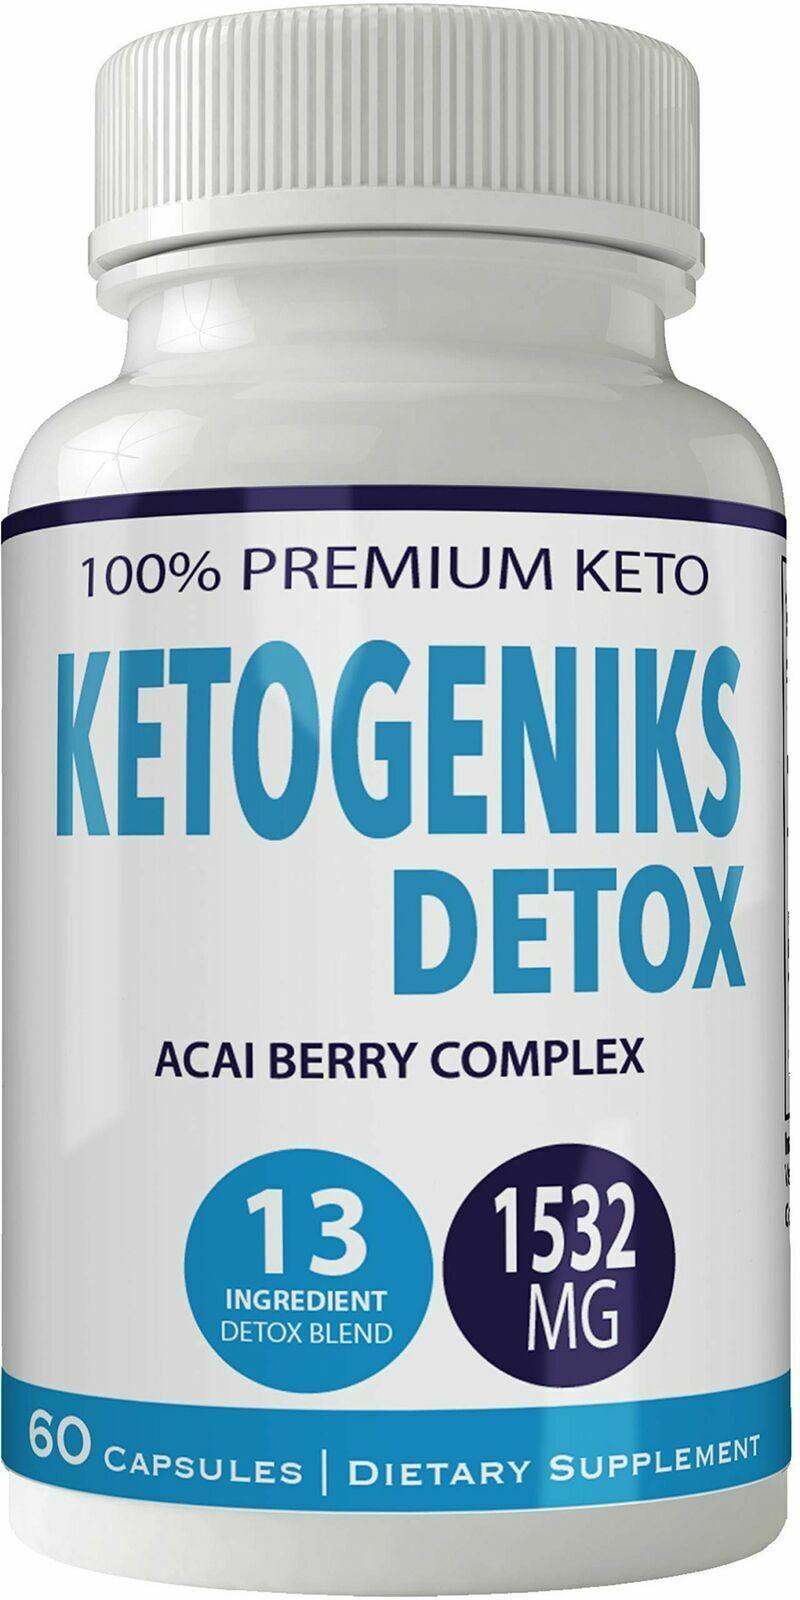 Ketogeniks Detox Pills Max Dietary Supplement 100% Natural Keto Formula